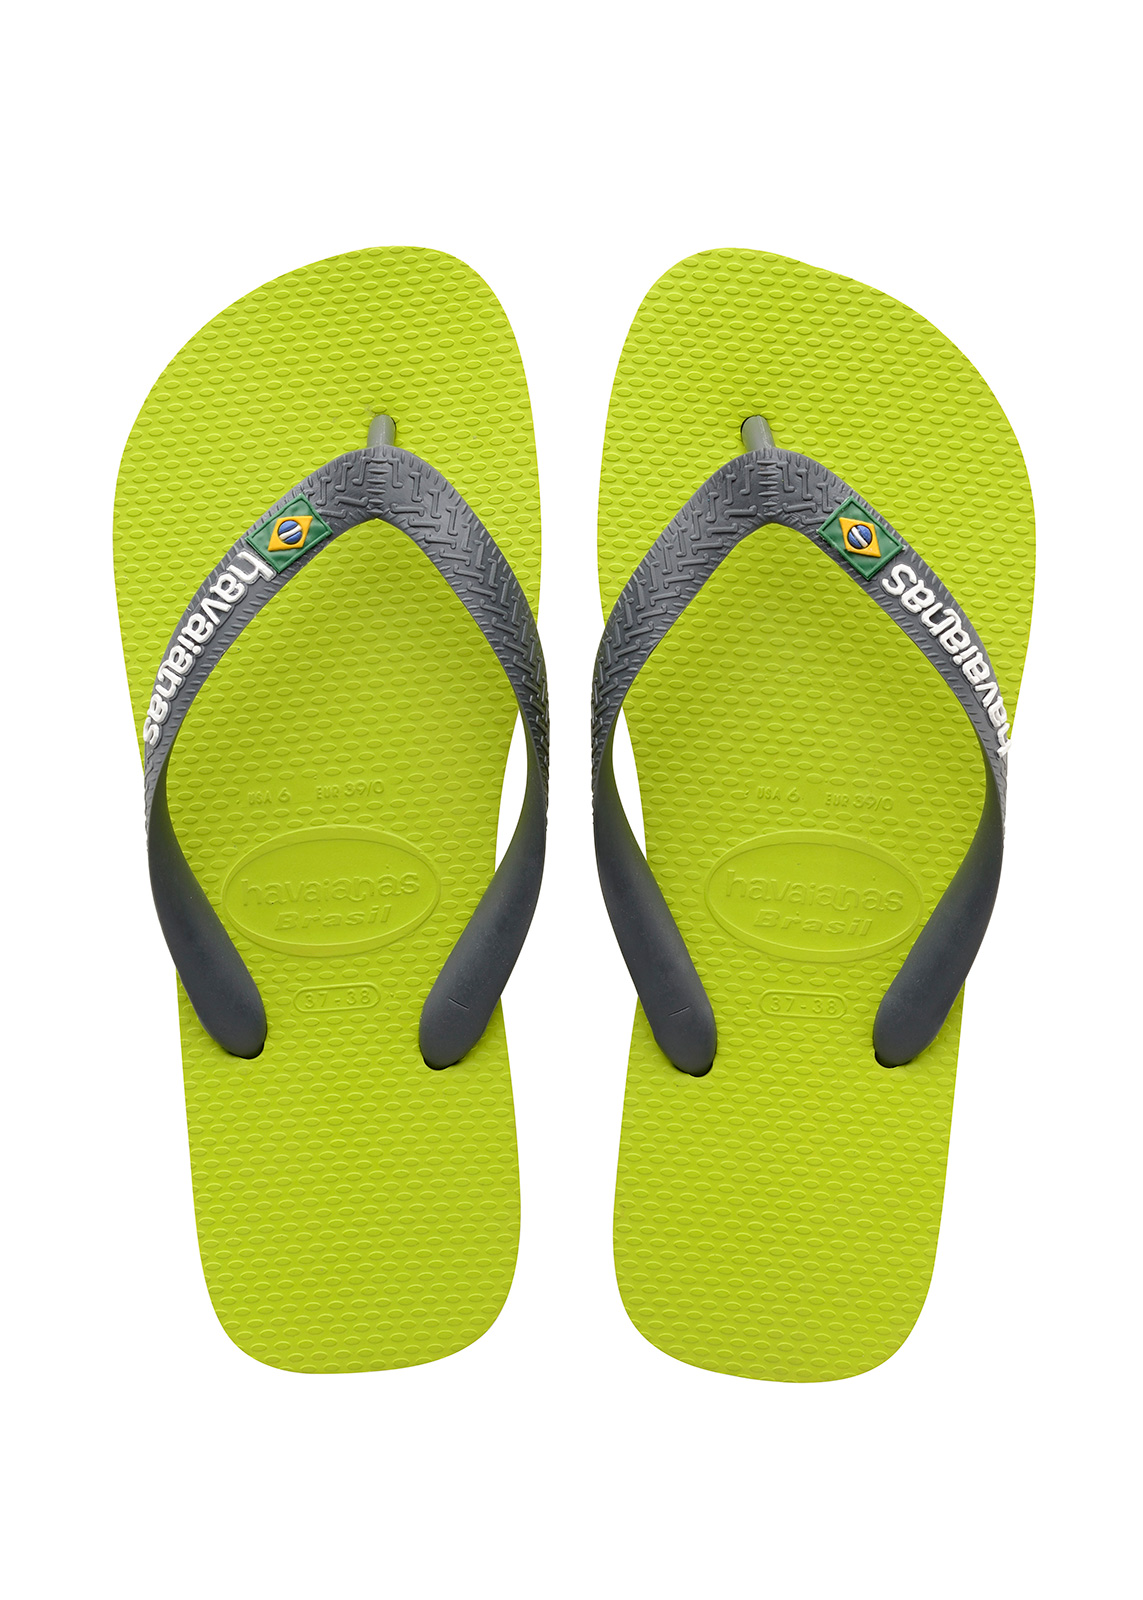 new concept 391f7 4860e Flip-flops - Havaianas Brasil Logo Lime Green/grey